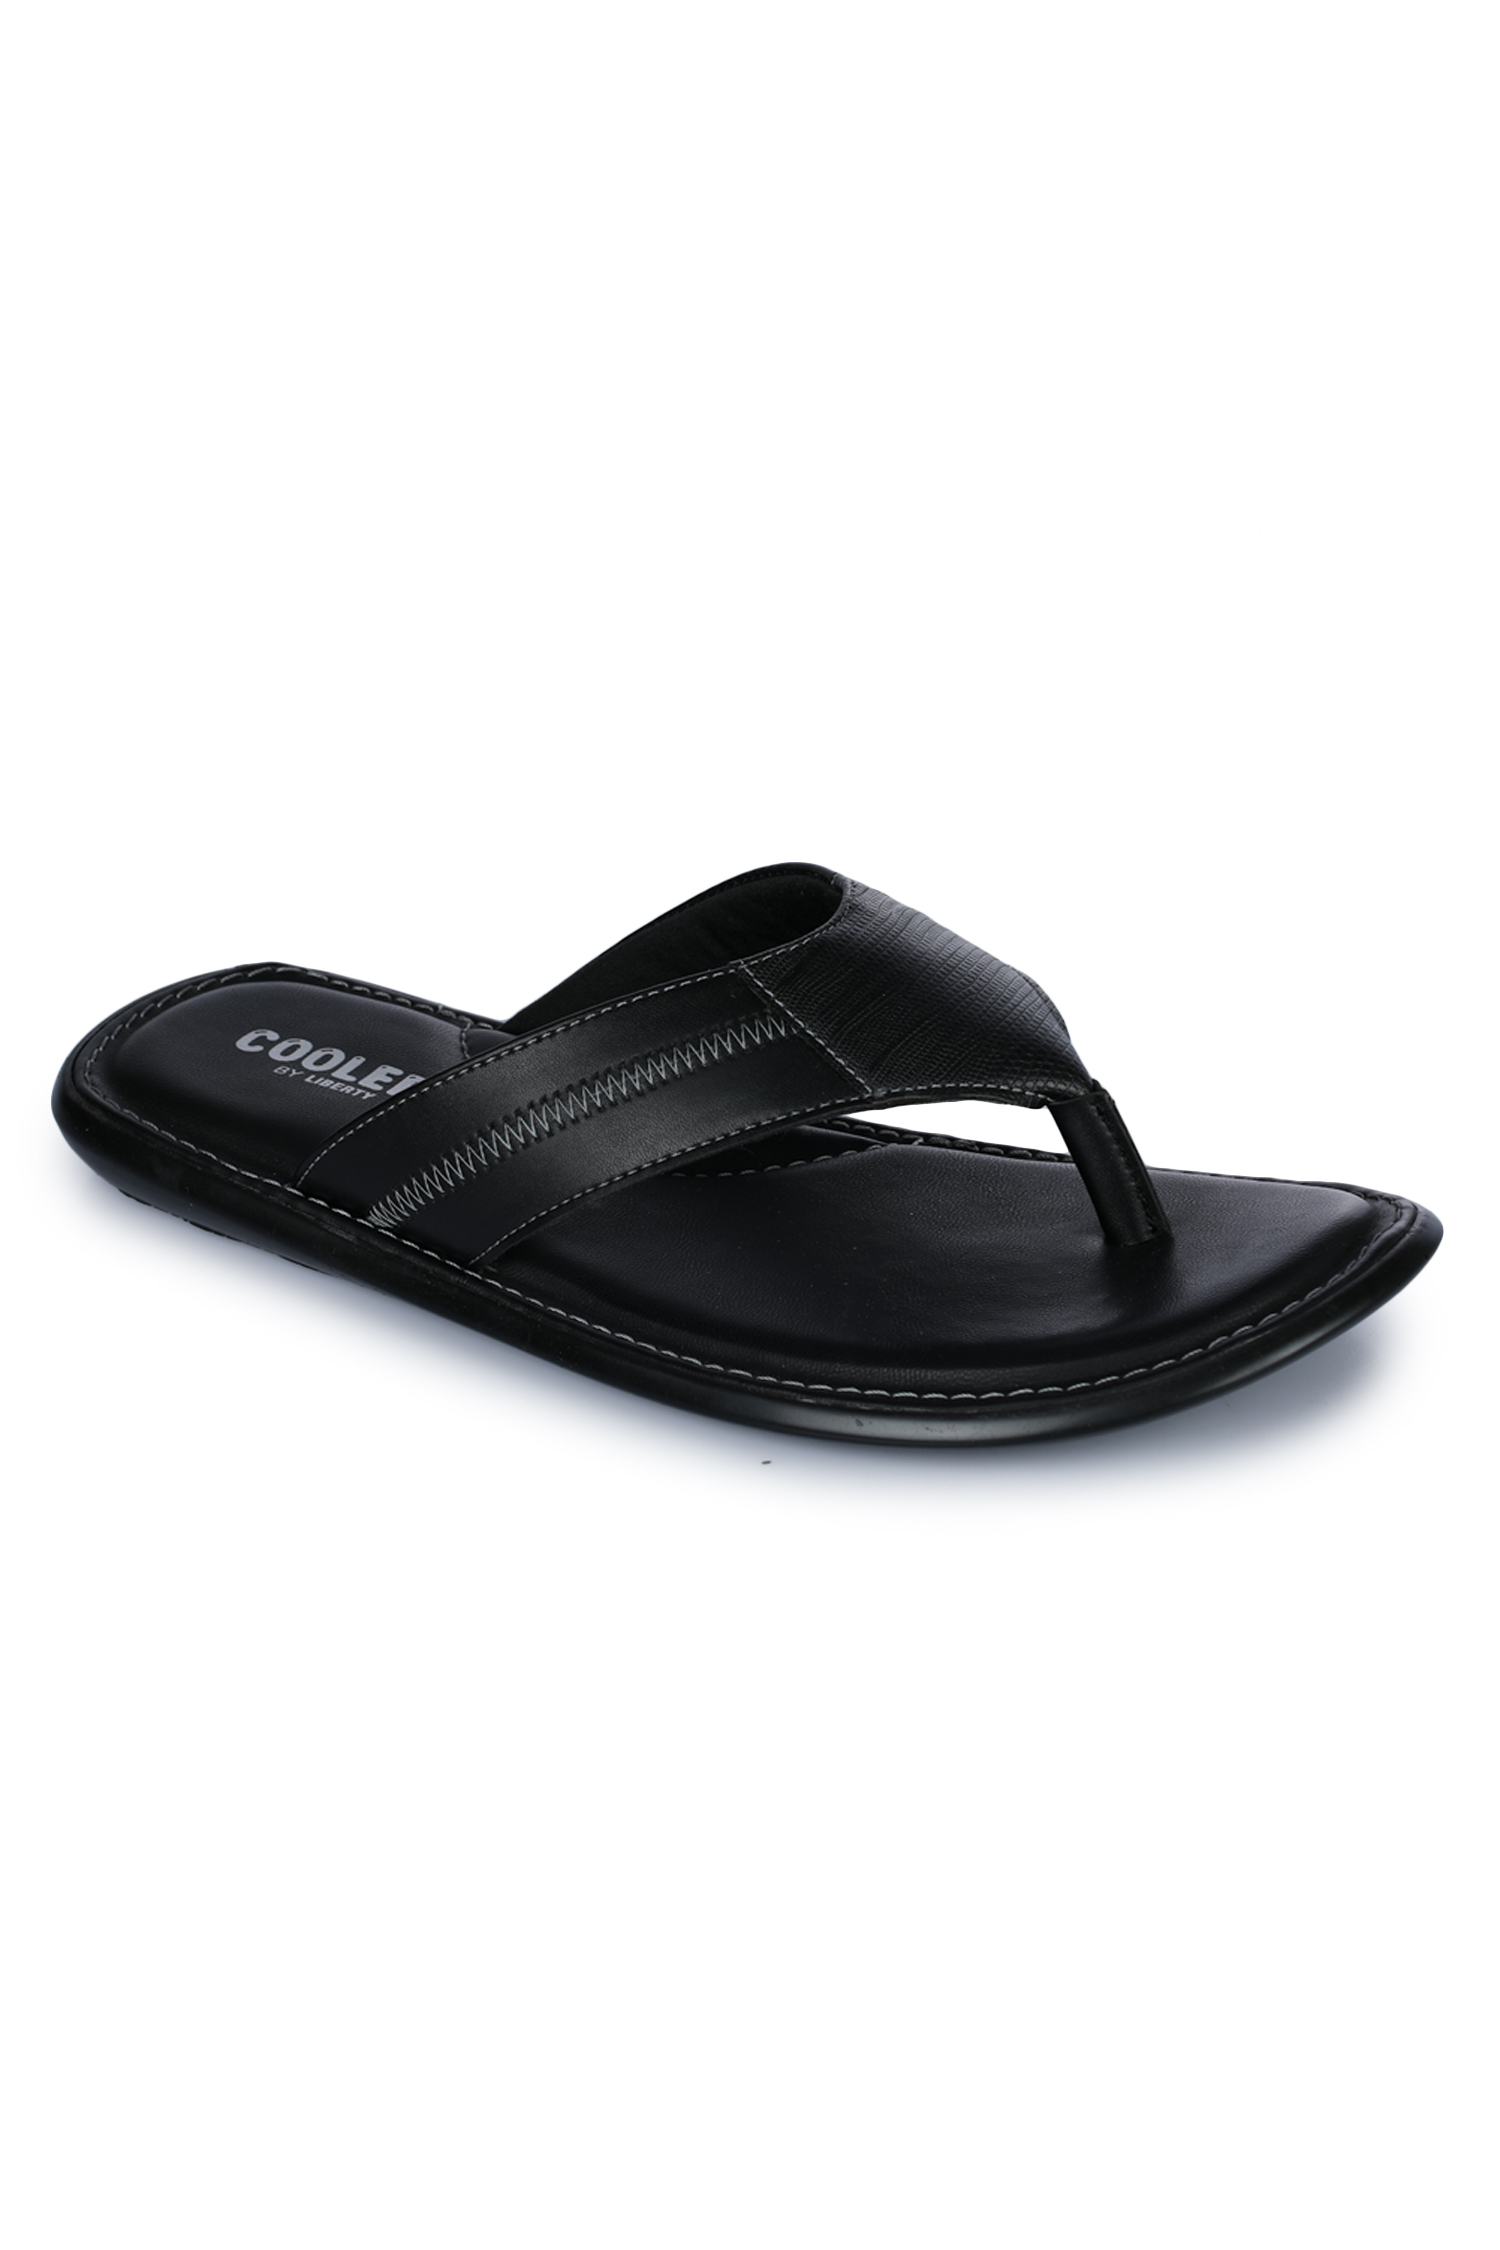 Liberty | Liberty COOLERS Slippers JJP-15_BLACK For - Men